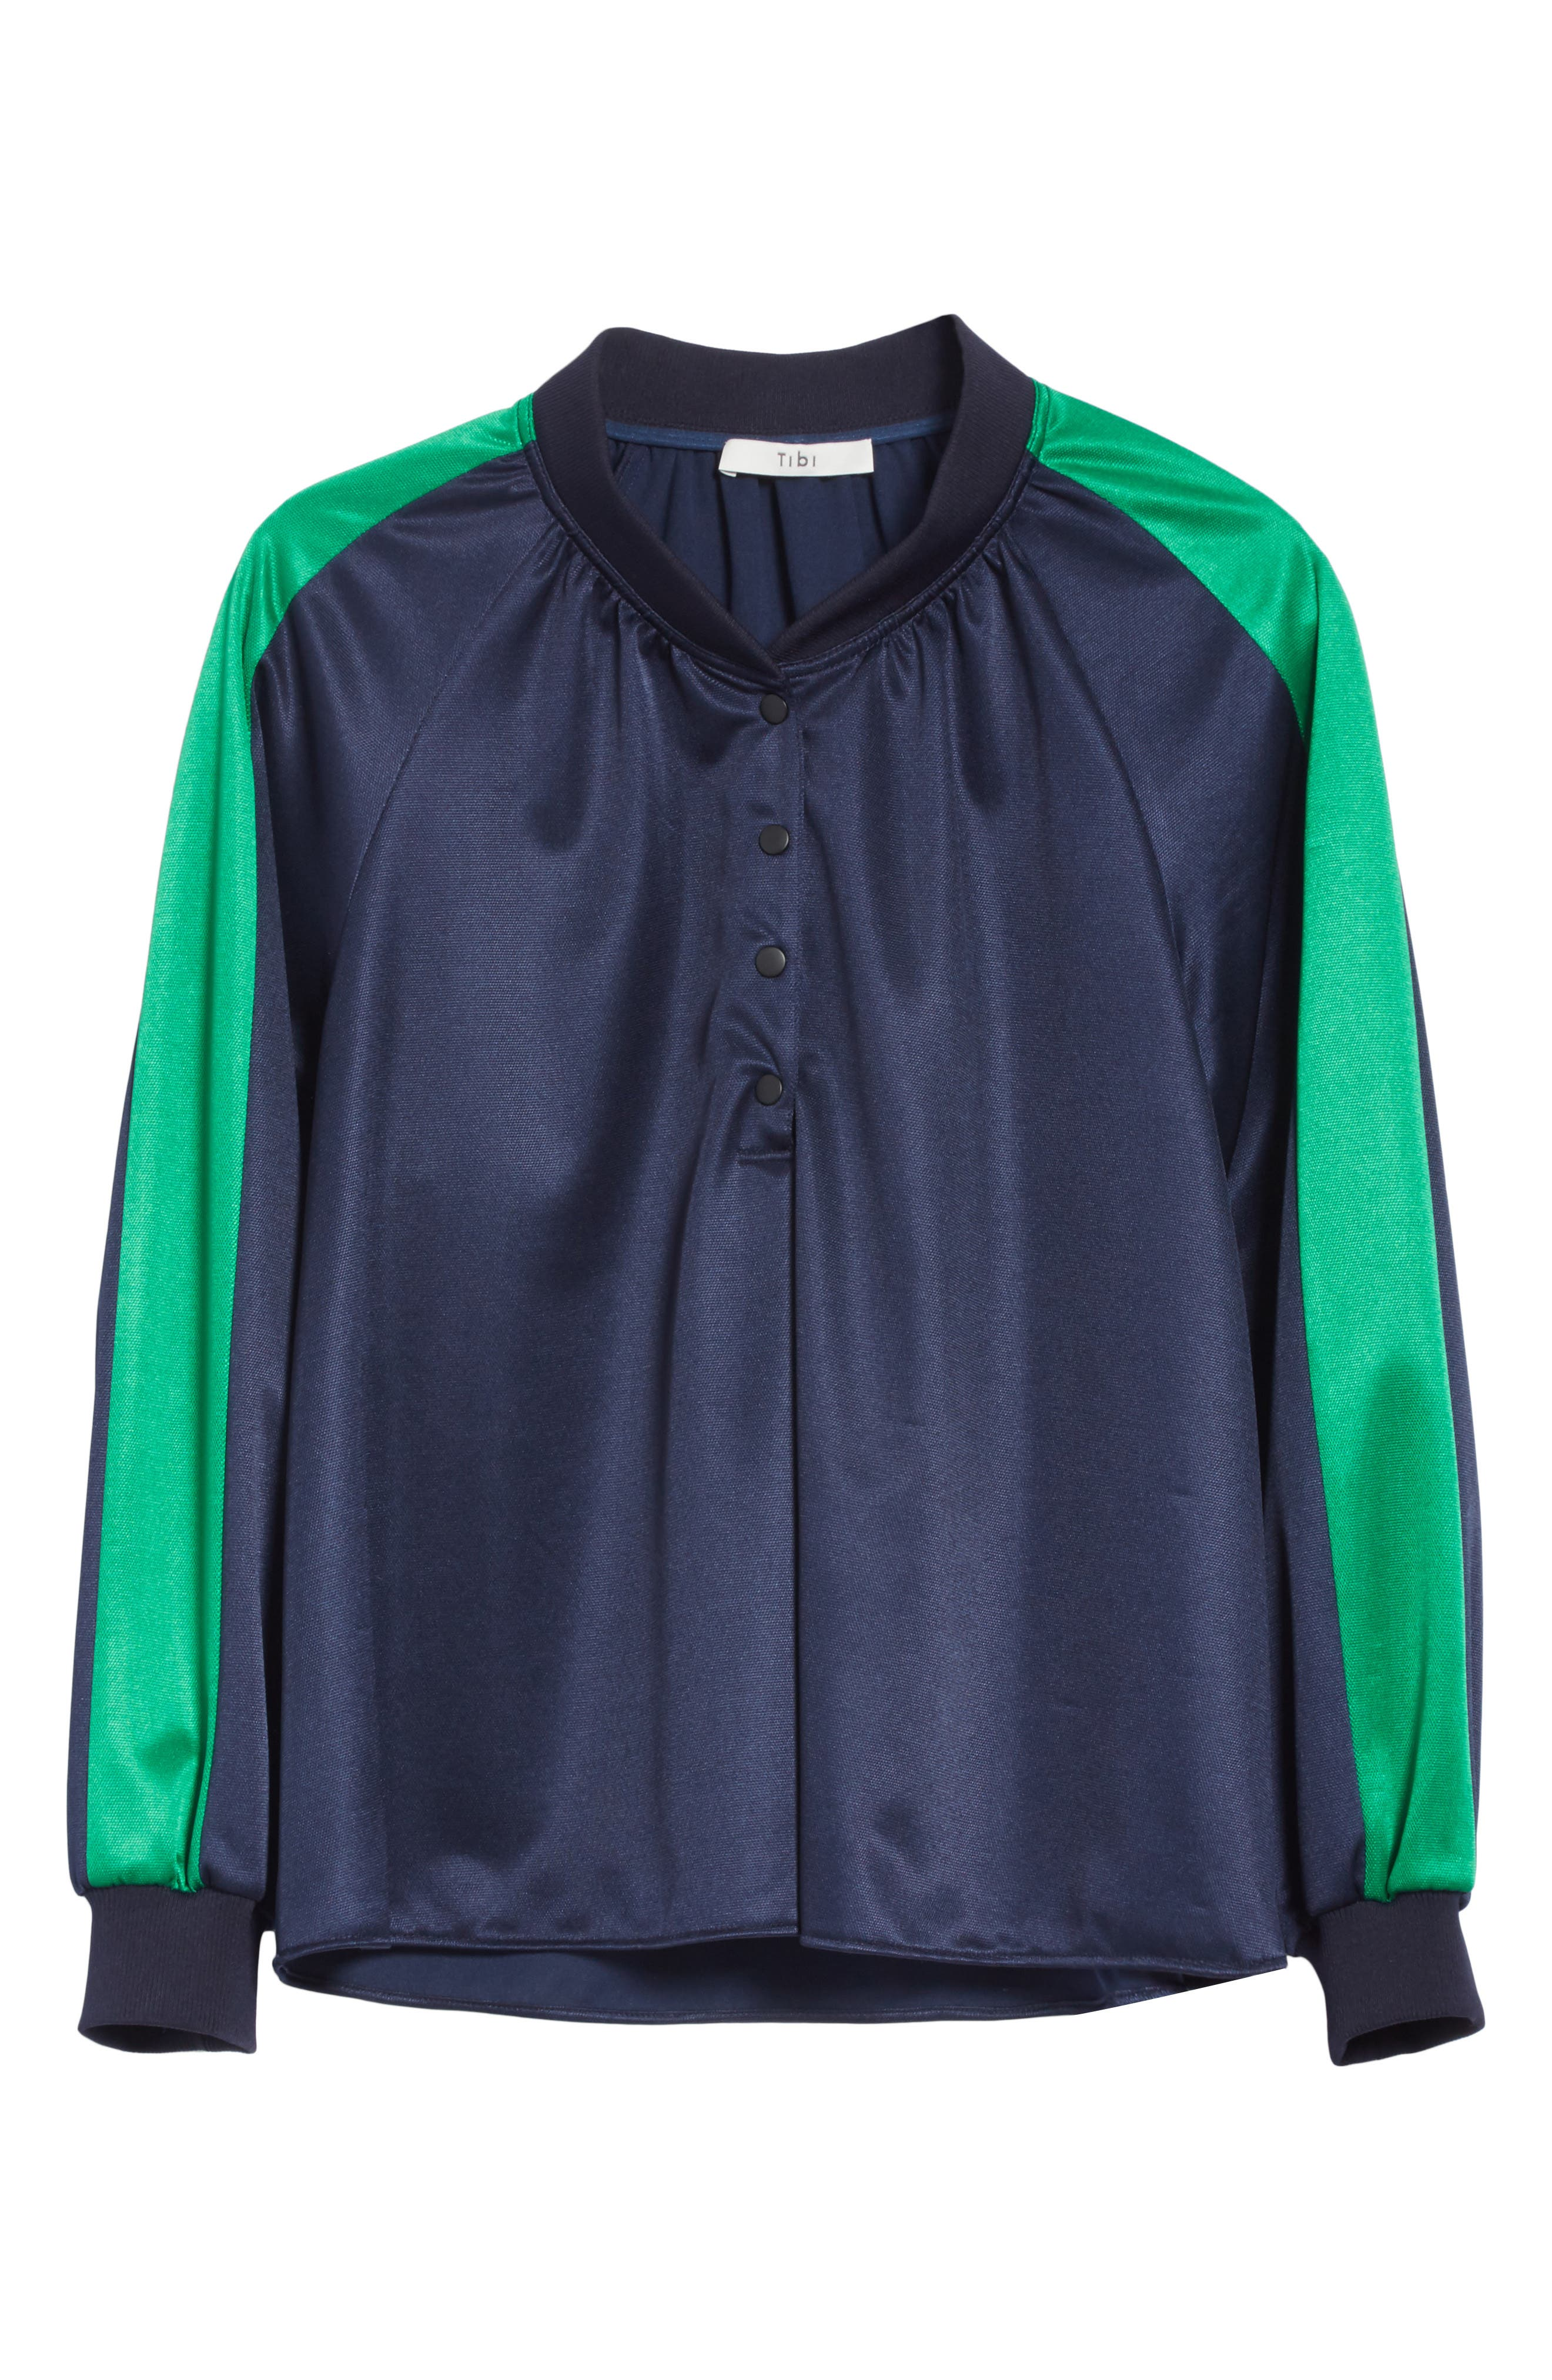 Pullover Track Jacket,                             Alternate thumbnail 6, color,                             Navy/ Green Multi